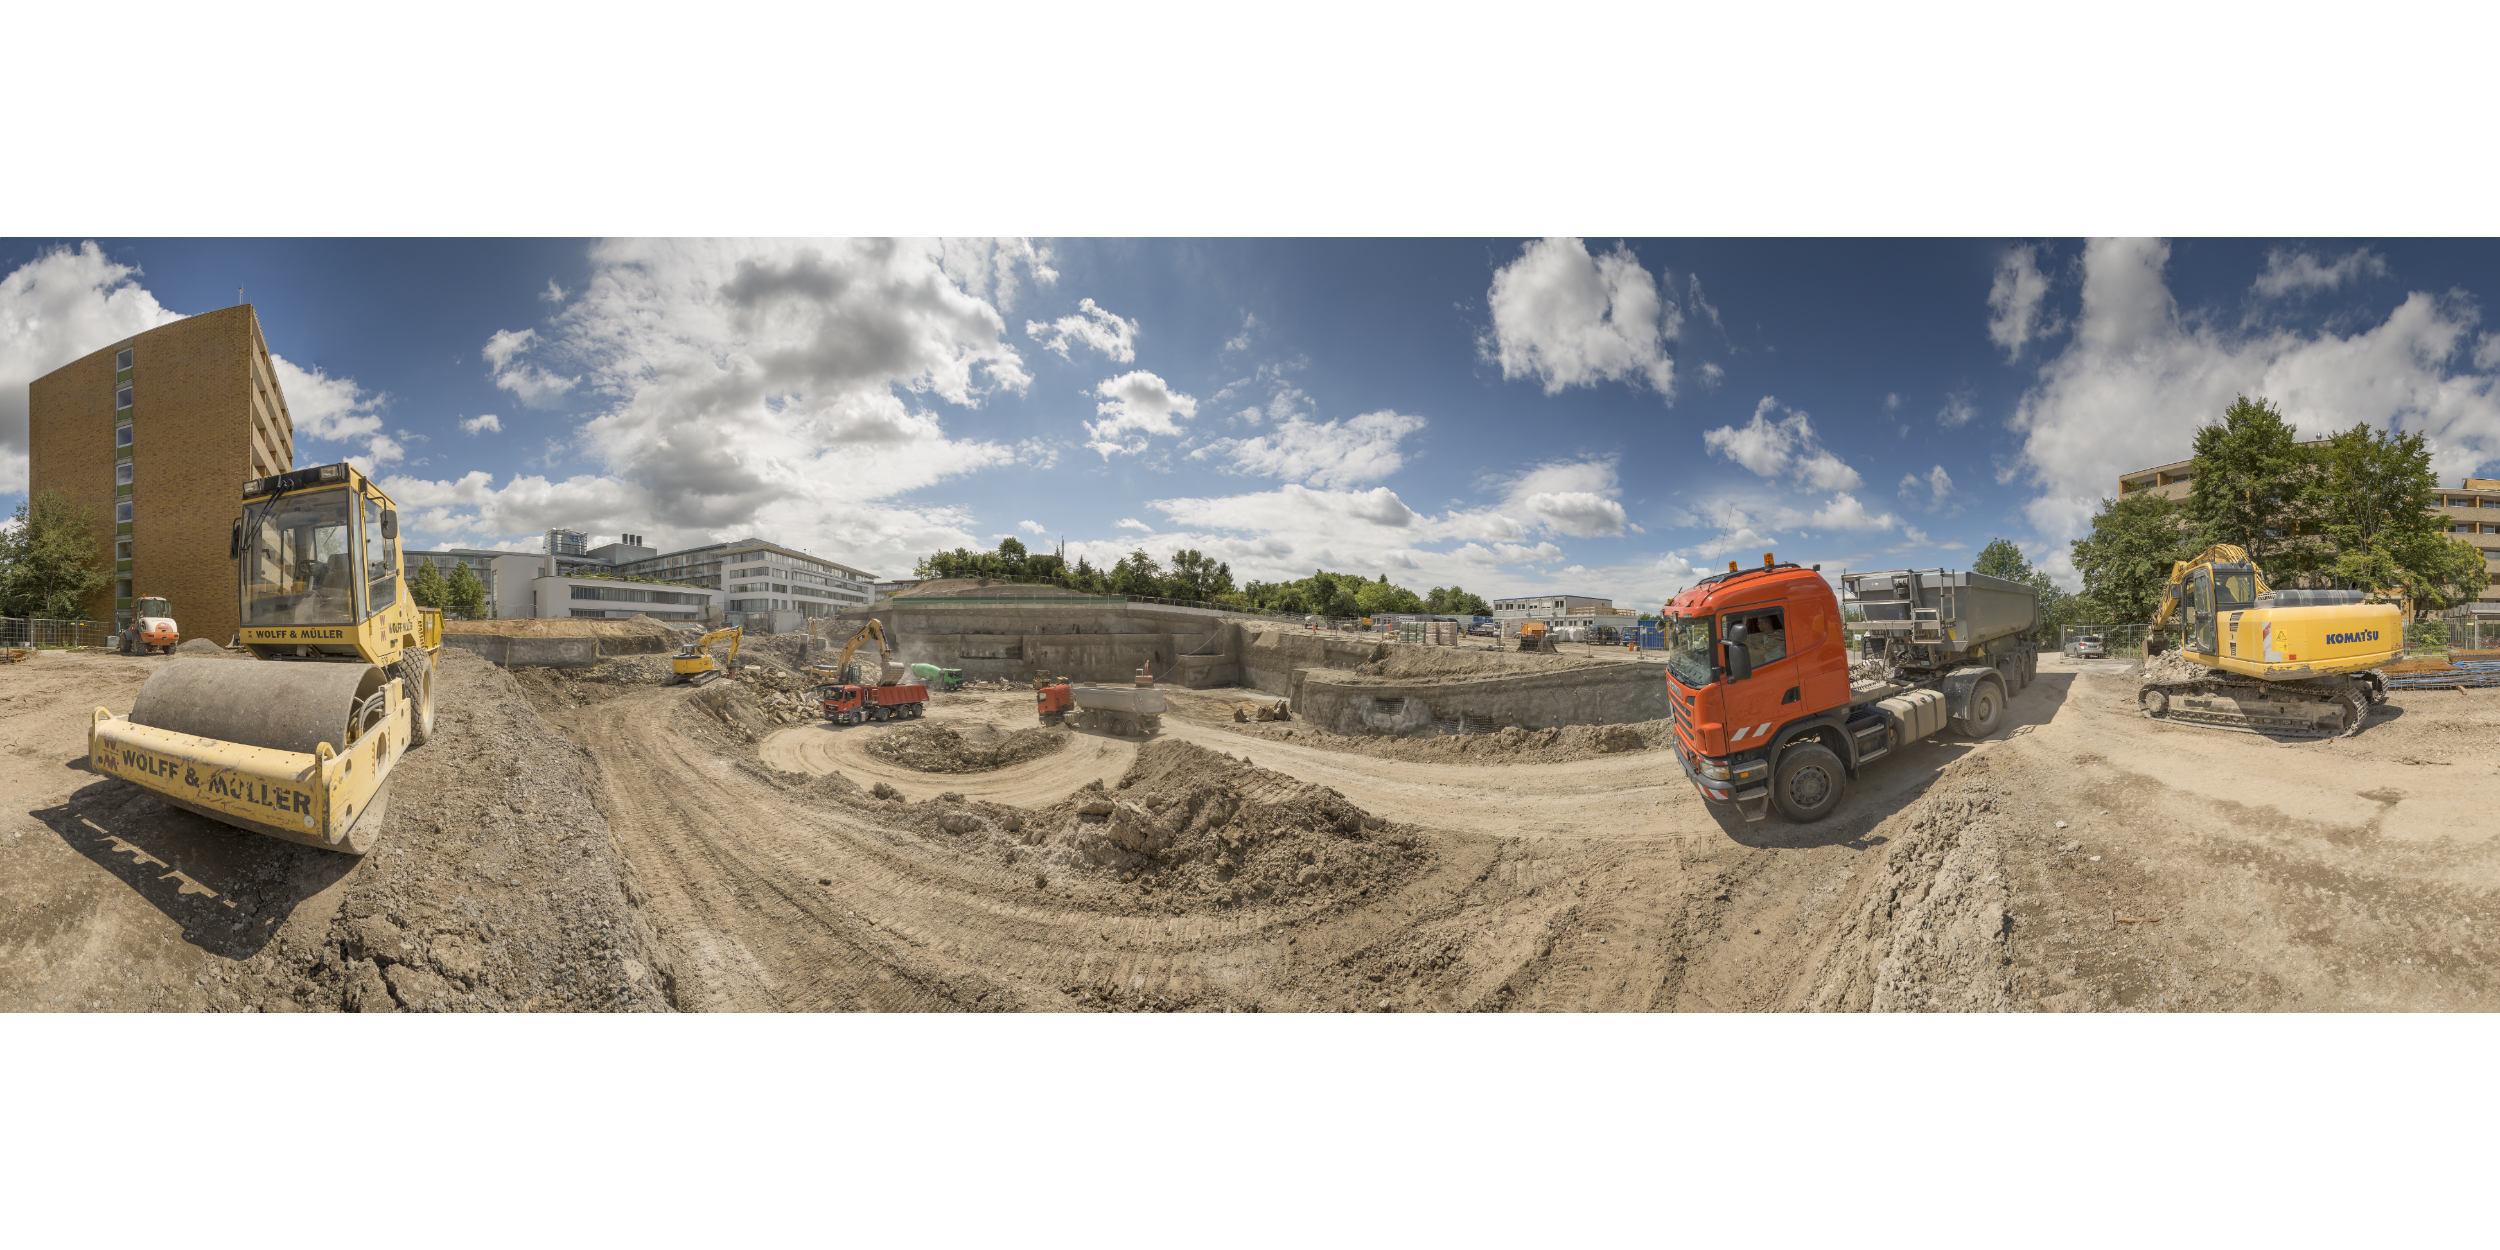 Panoramafotografie Virtuelle Touren 360Grad Fotografie Stuttgart und Umgebung Baustelle Wolff und Müller Robert Bosch Krankenhaus LKW Bagger Erdbewegung 180Grad